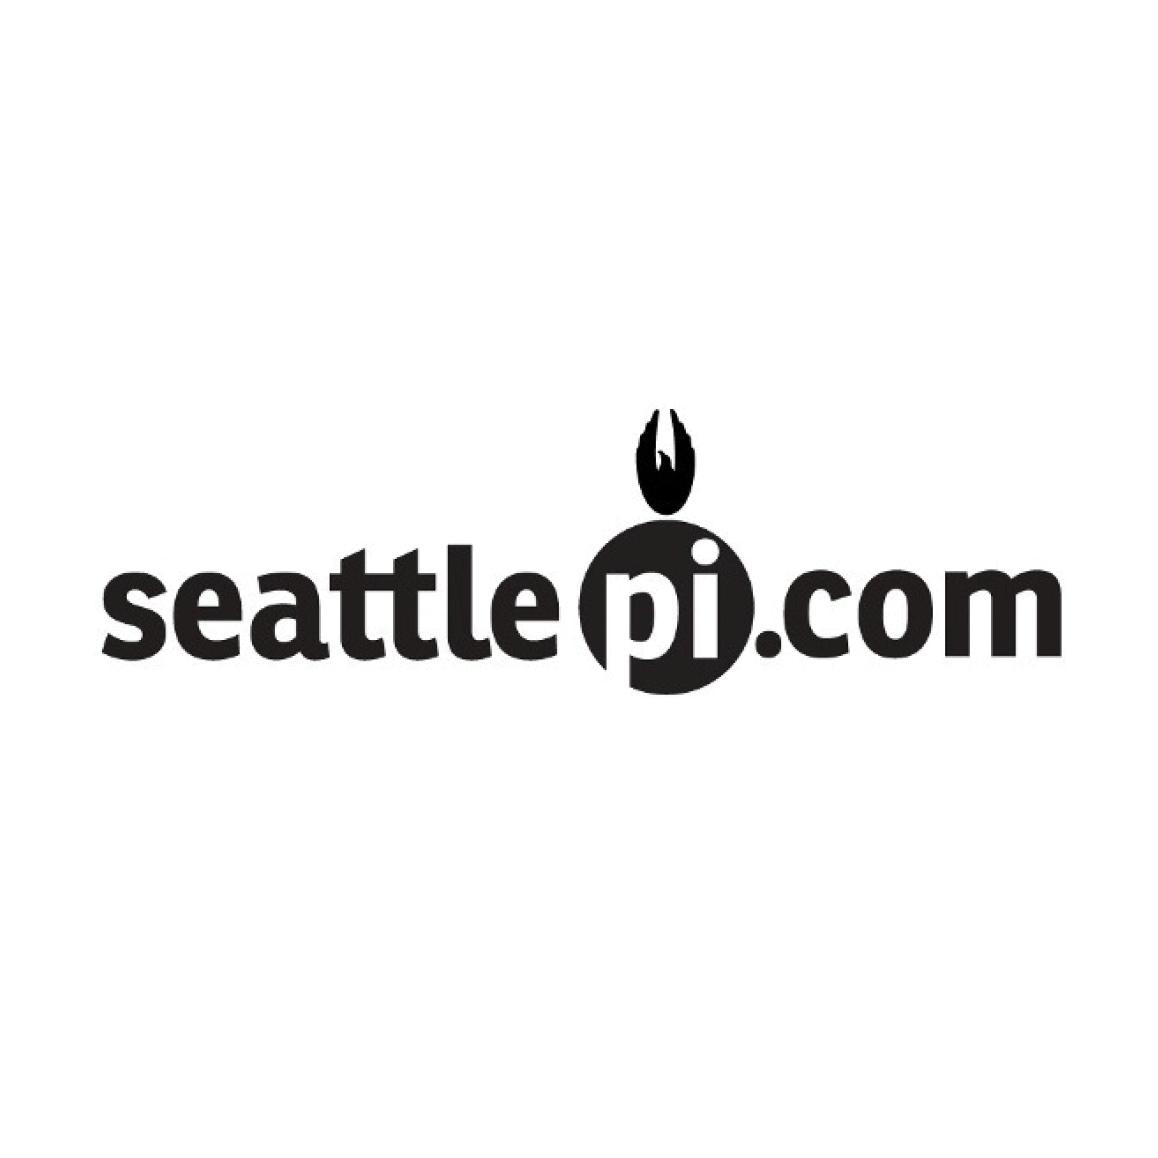 SeattlePl.com.png